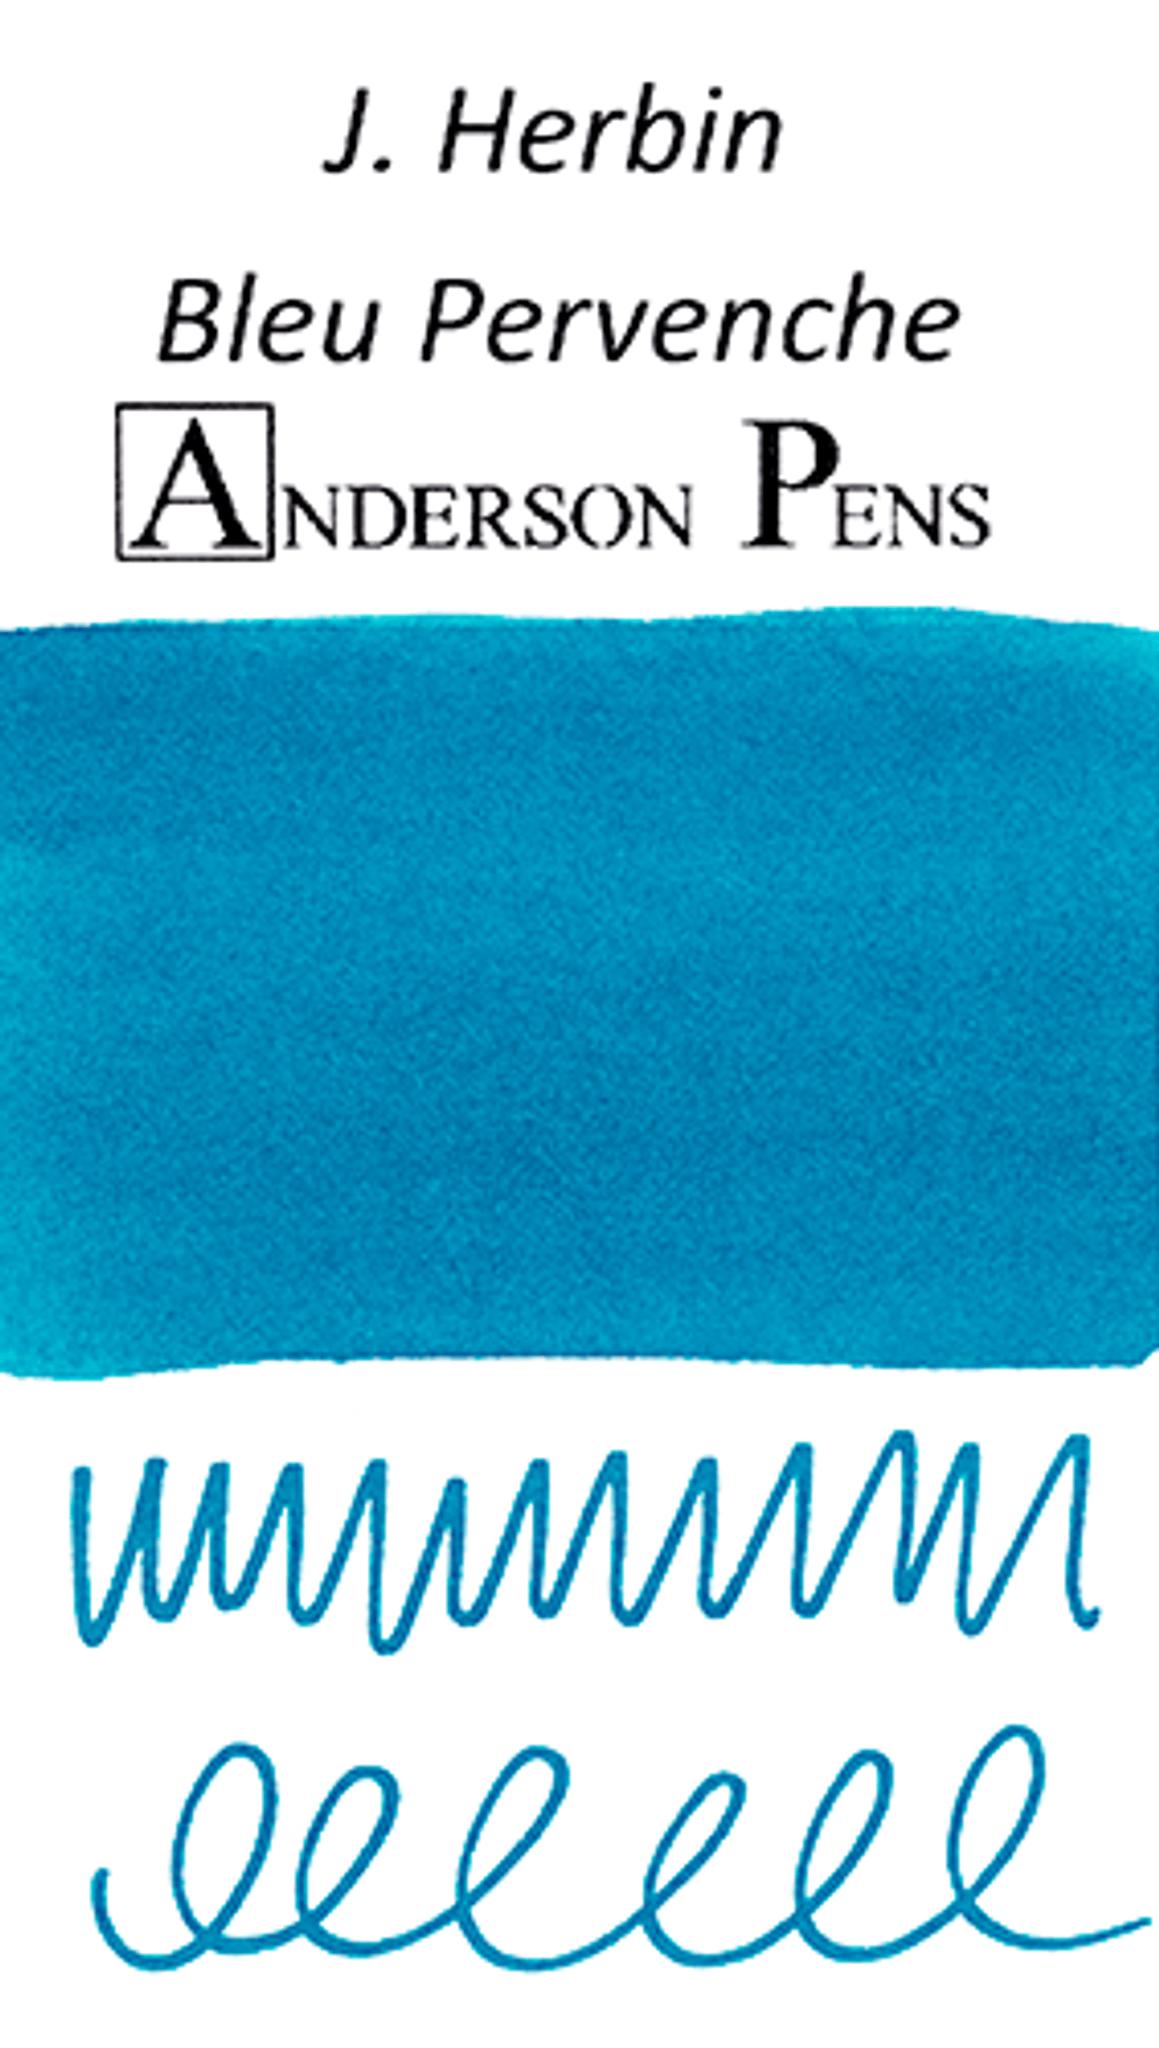 J Herbin 30ml Blue Bottled Ink Bleu Pervenche